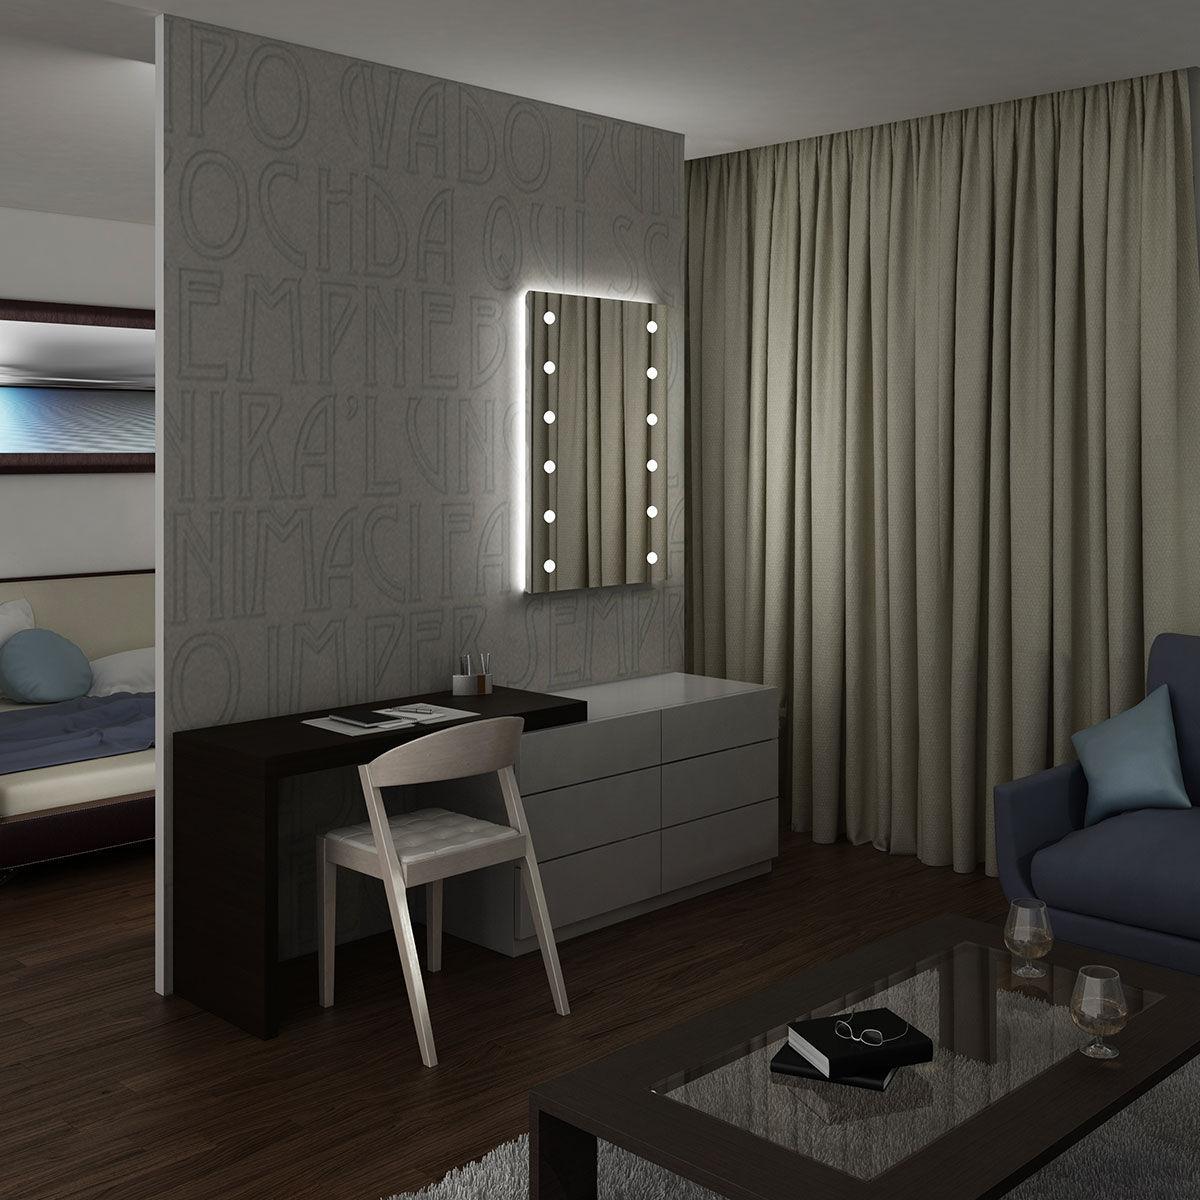 Superior Wall Mounted Mirror / Illuminated / Living Room / Bedroom   MH03